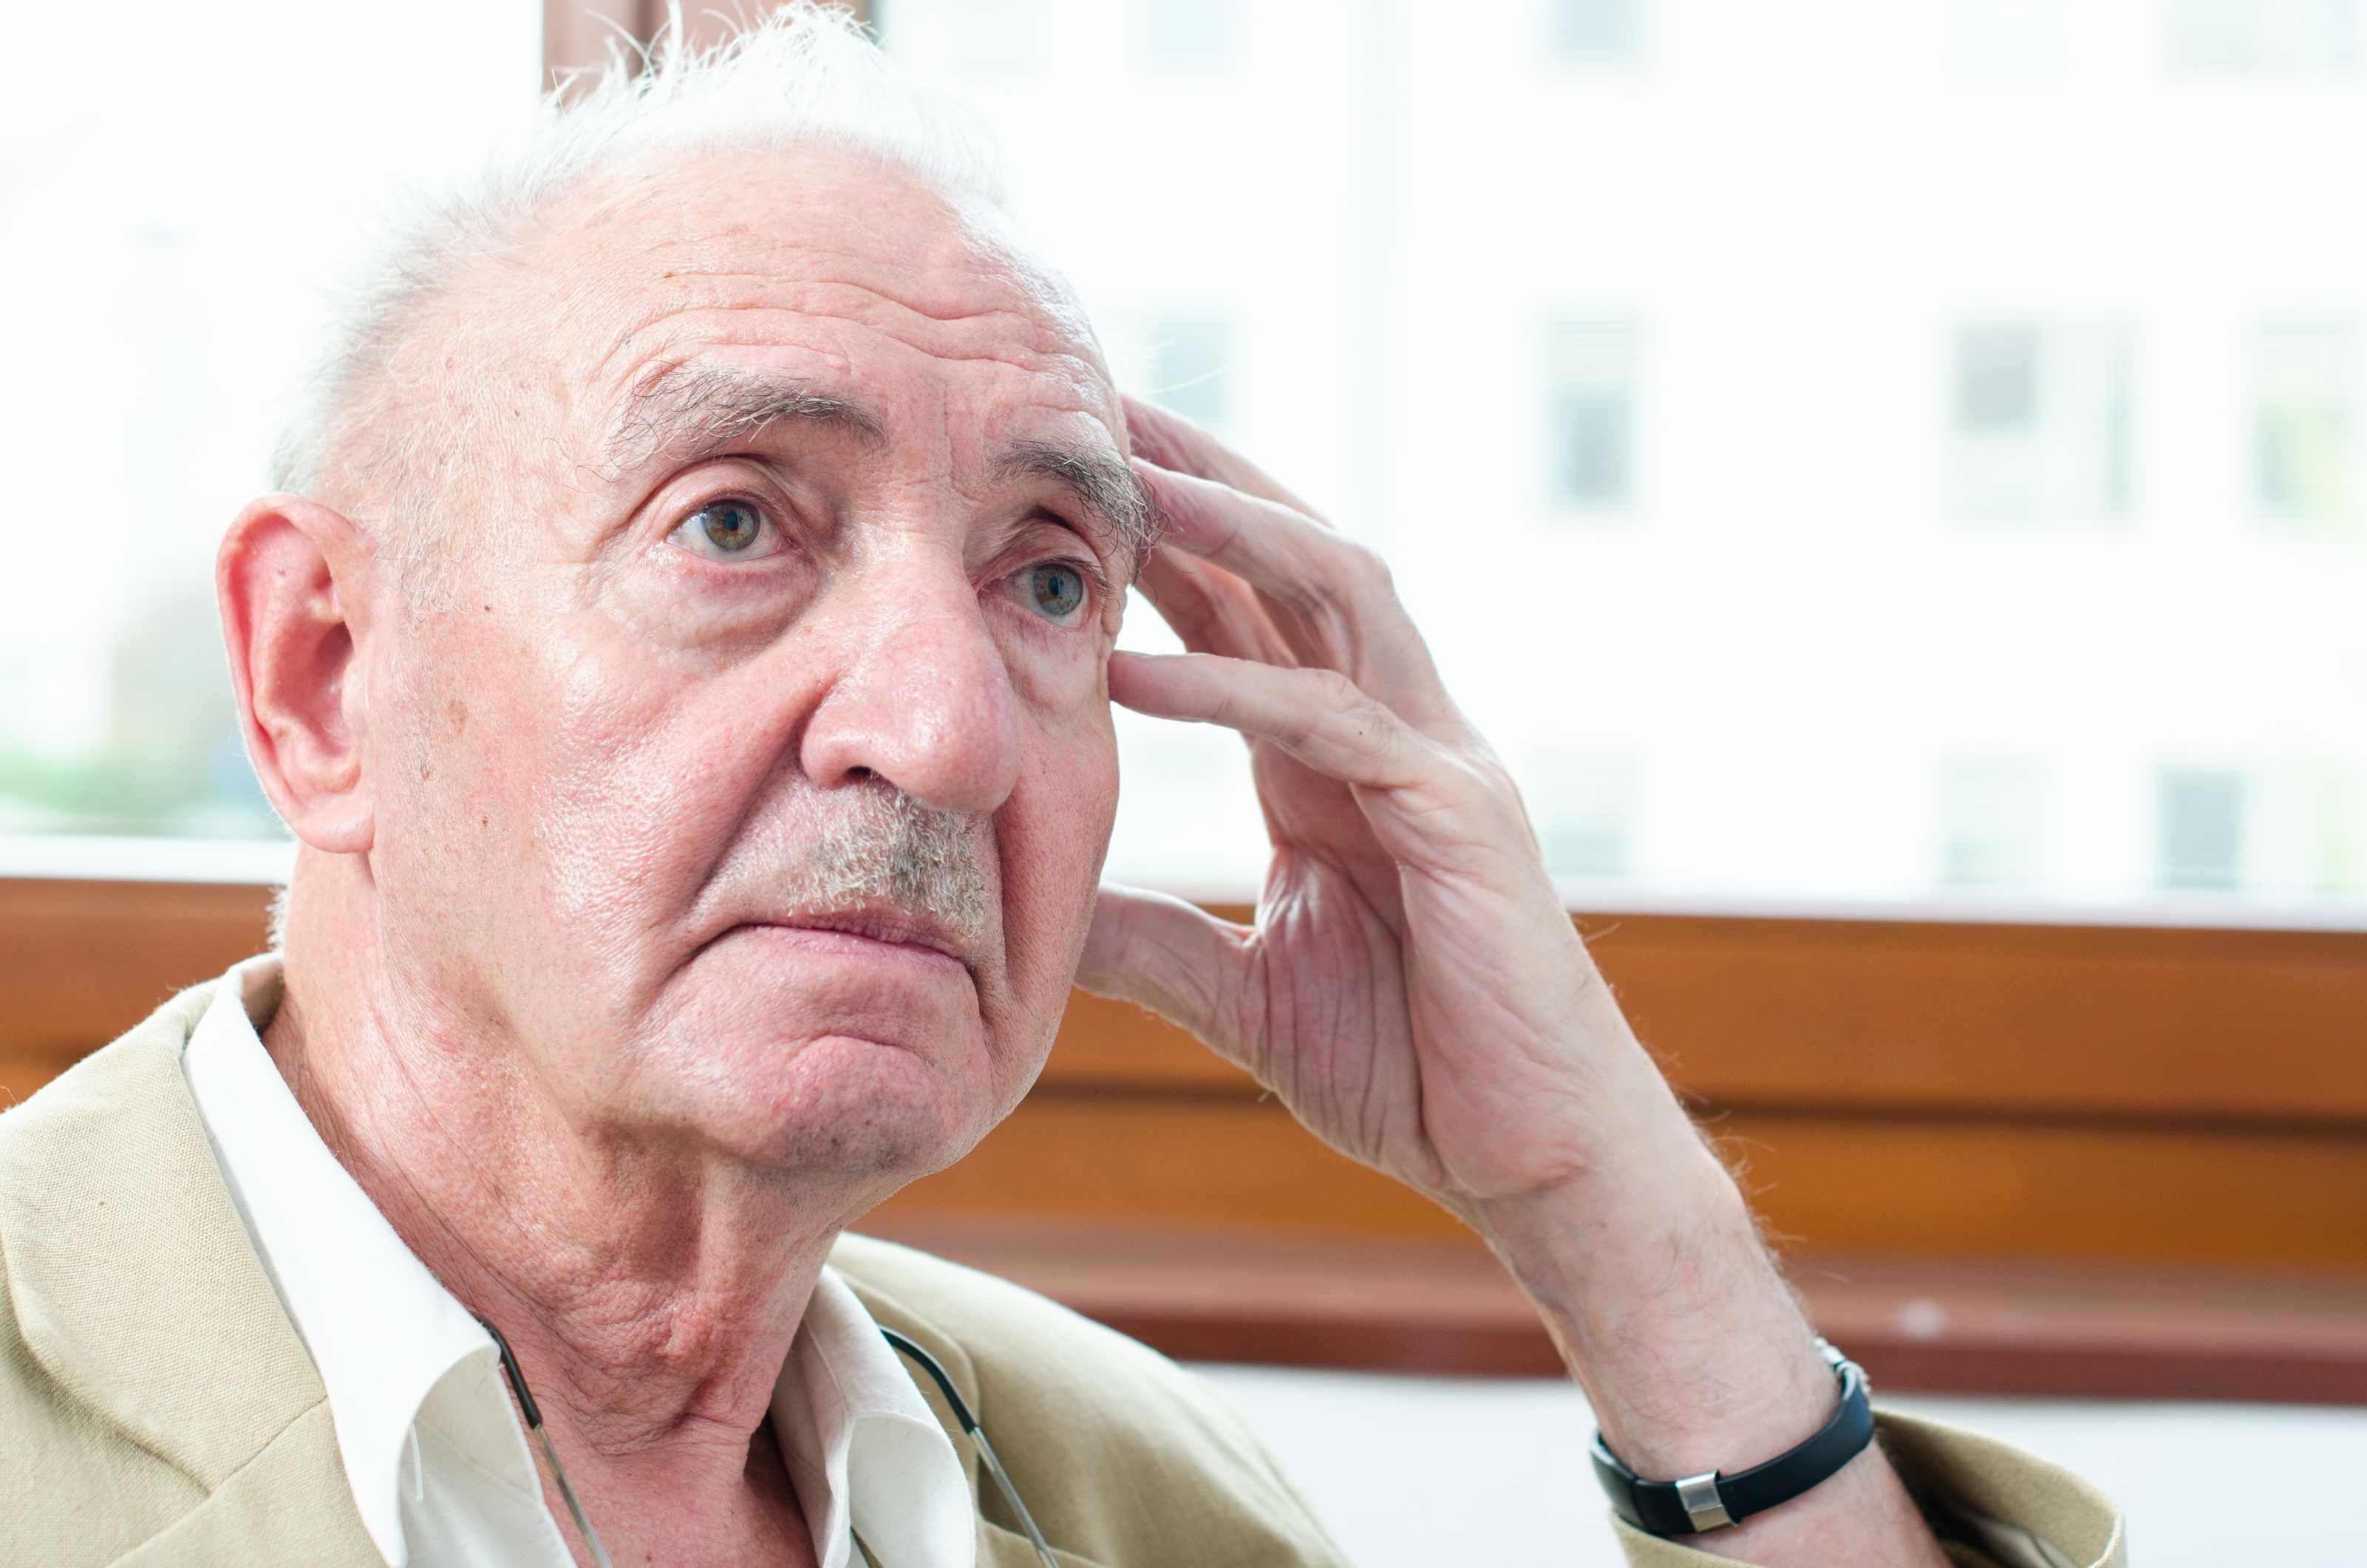 portrait of a senior man thinking